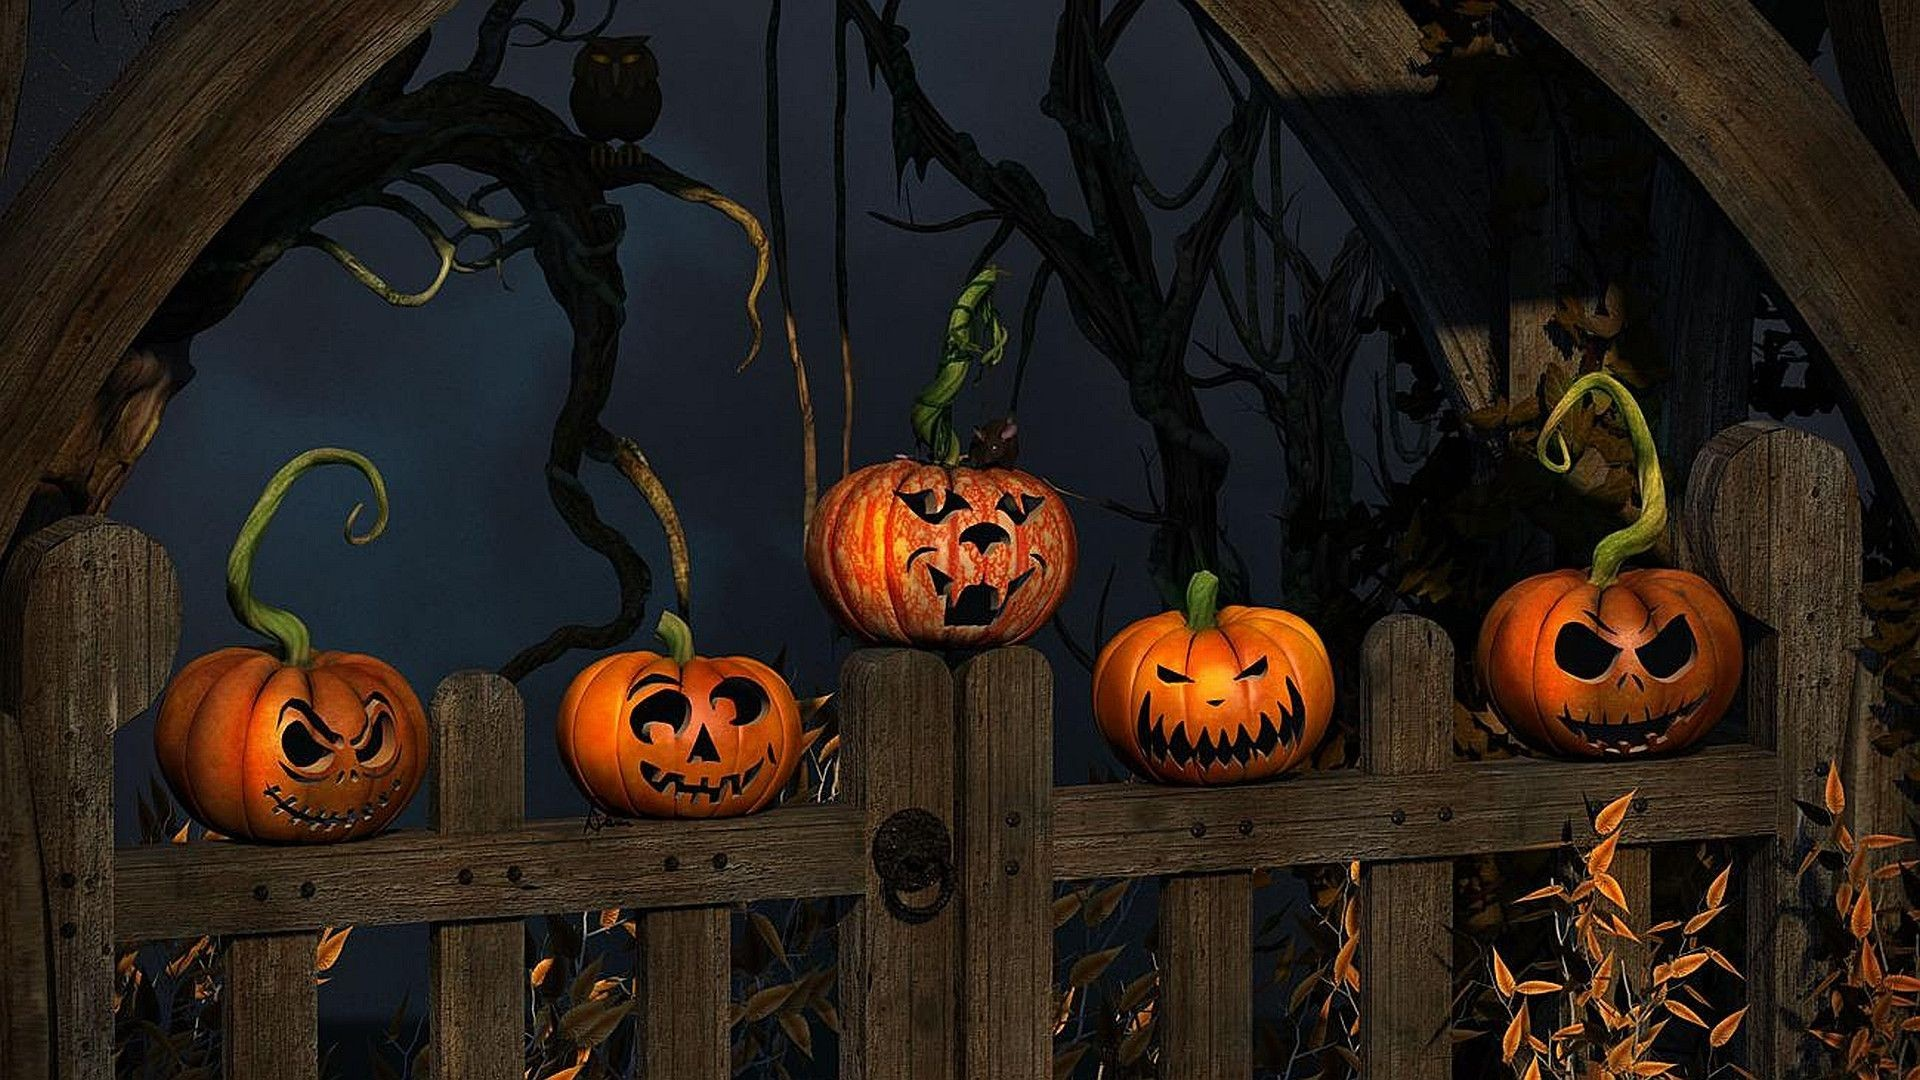 Great Wallpaper Halloween Windows 7 - 288163-popular-halloween-backgrounds-1920x1080-for-windows-7  You Should Have_61971.jpg